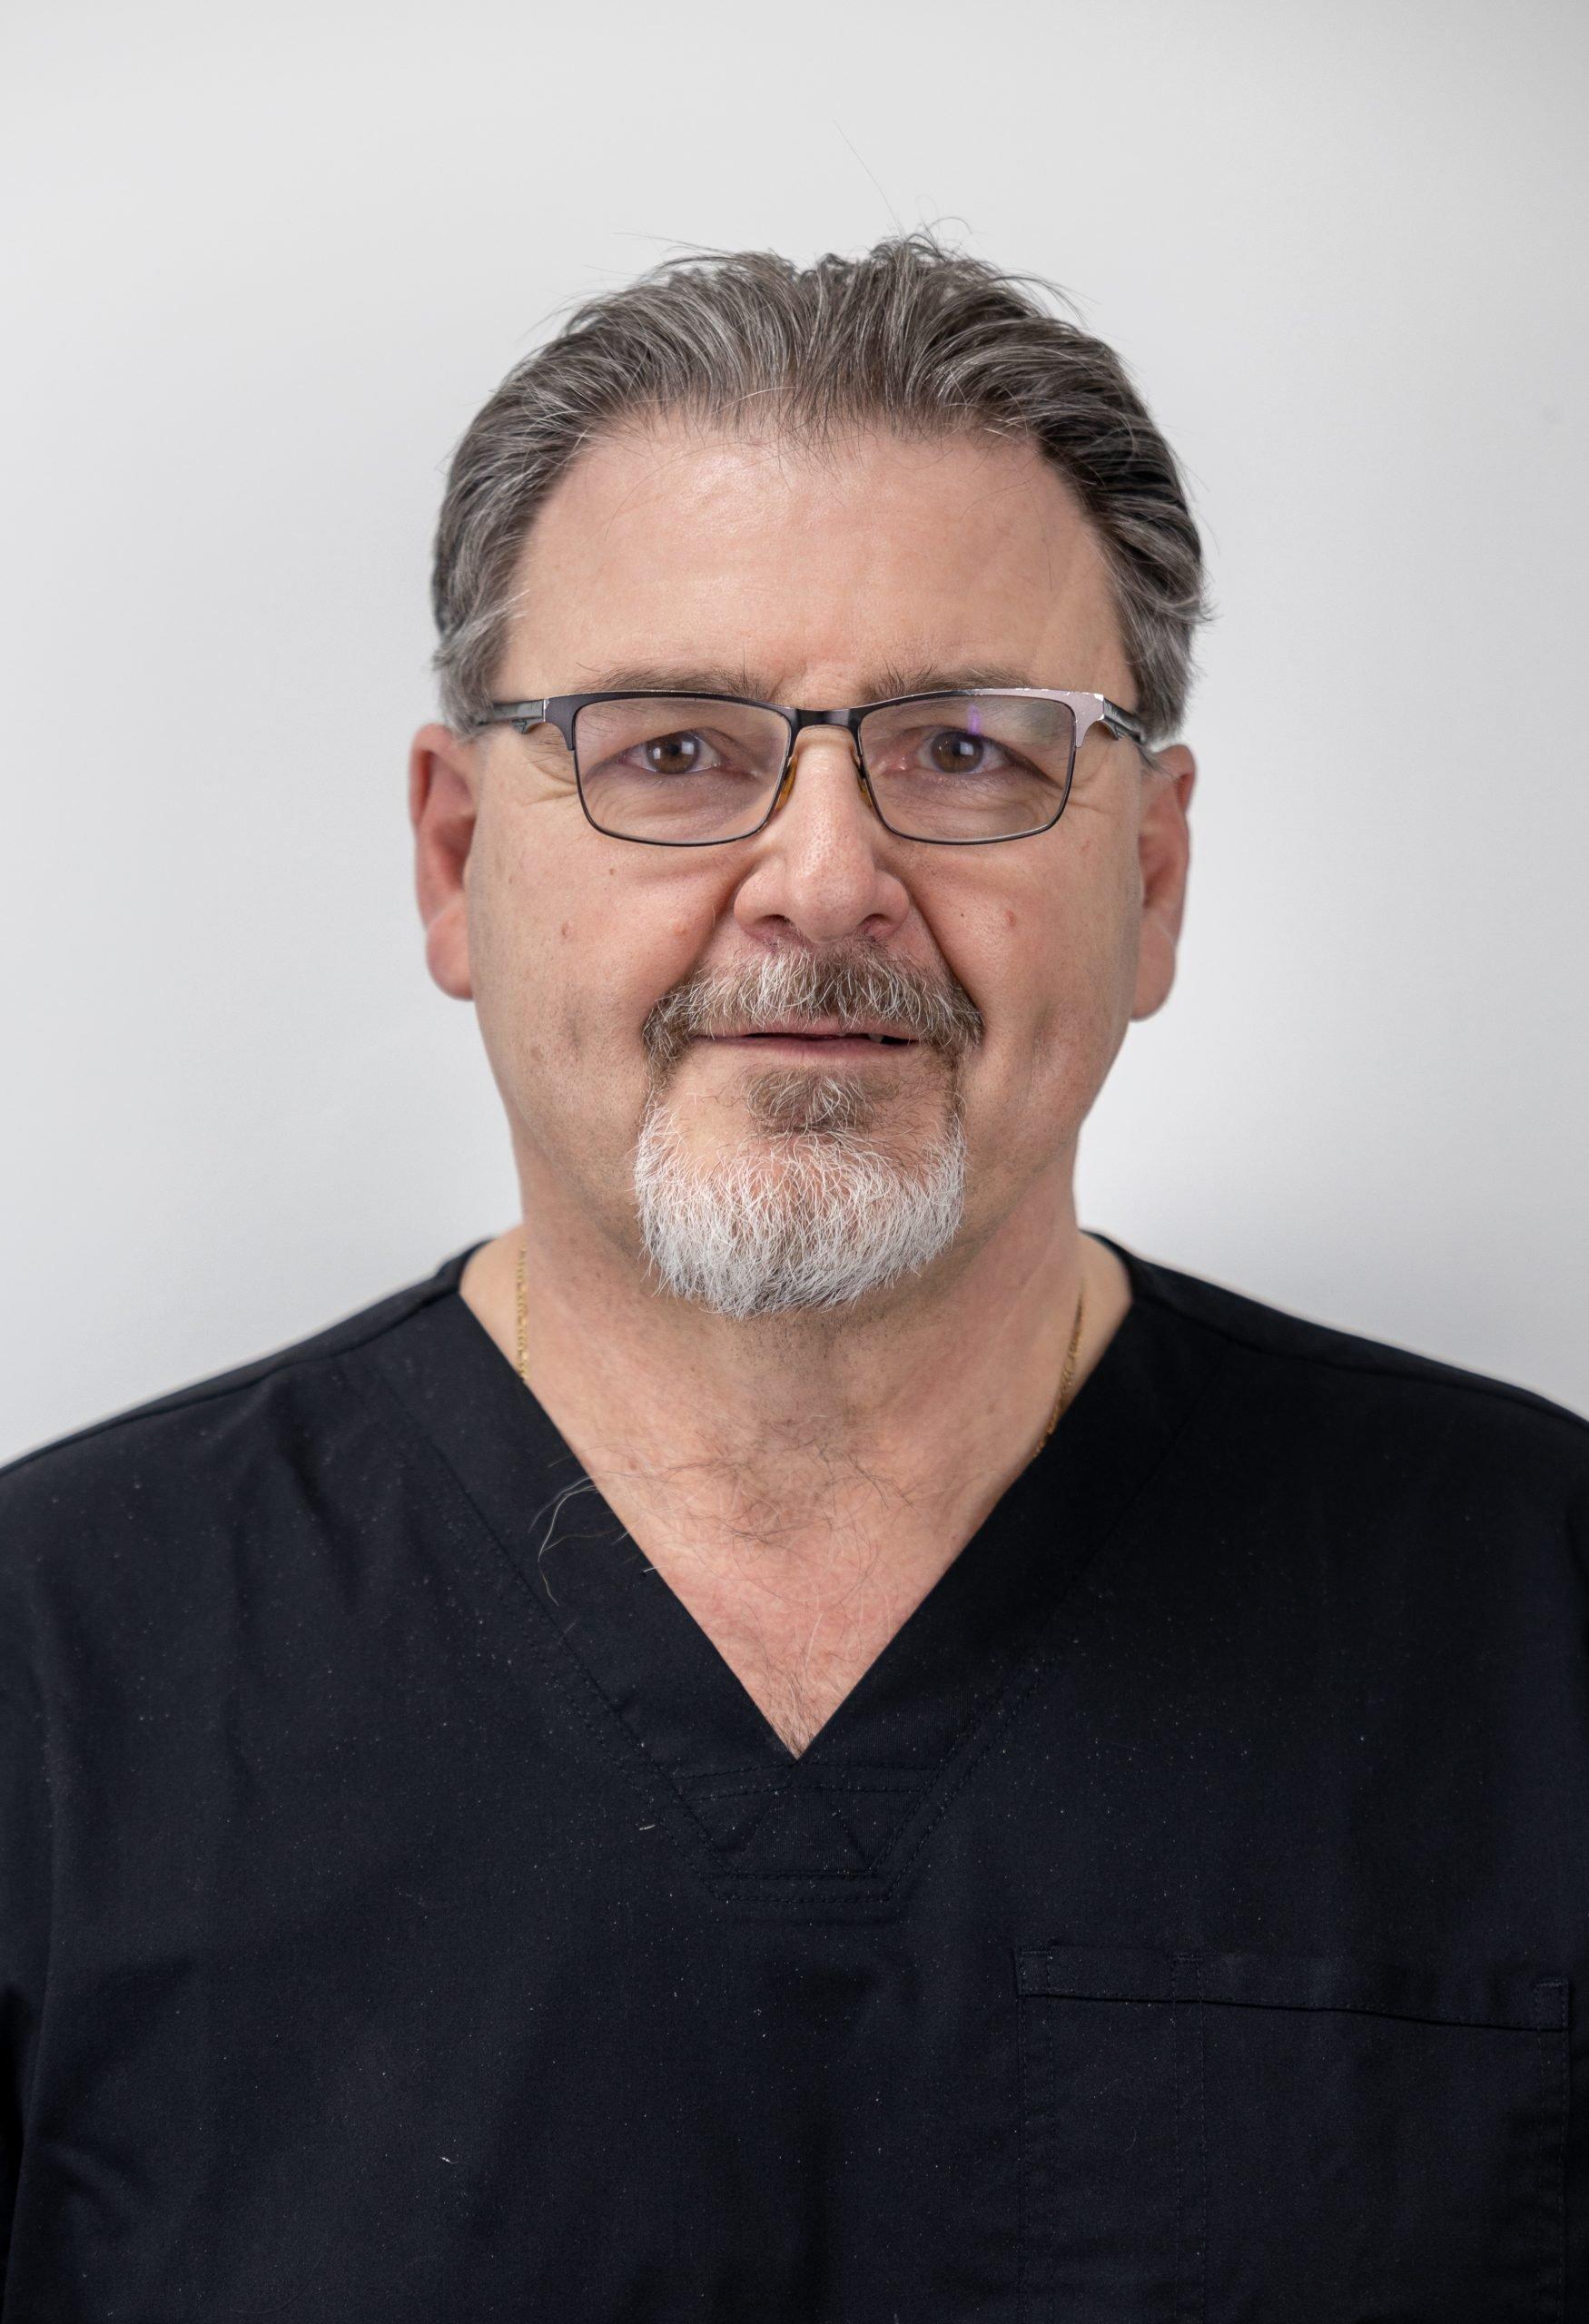 Dr. Kyros